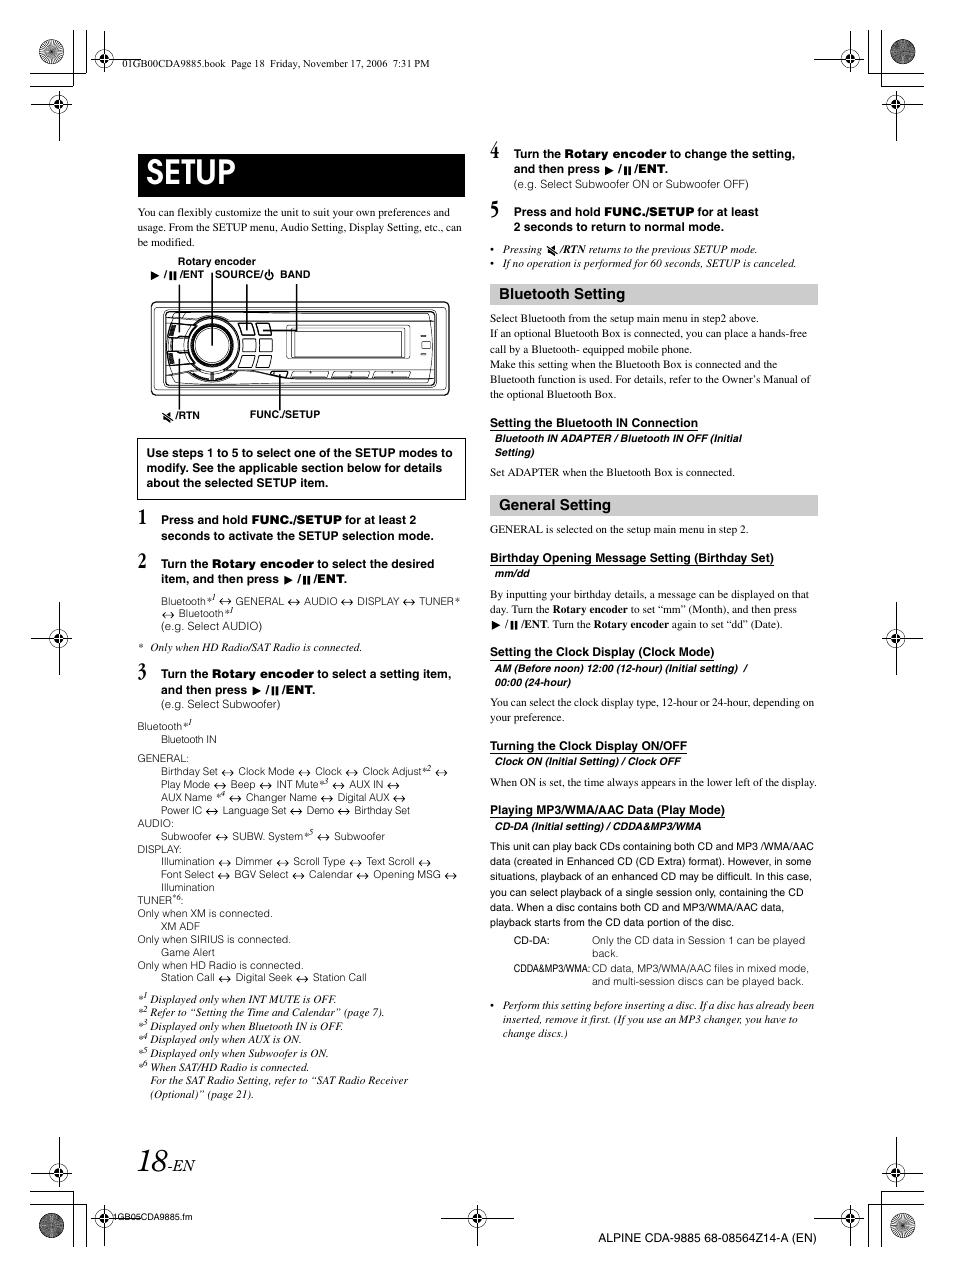 setup bluetooth setting general setting alpine cda 9885 user rh manualsdir com alpine cda 9887 manual alpine cda 9885 owners manual